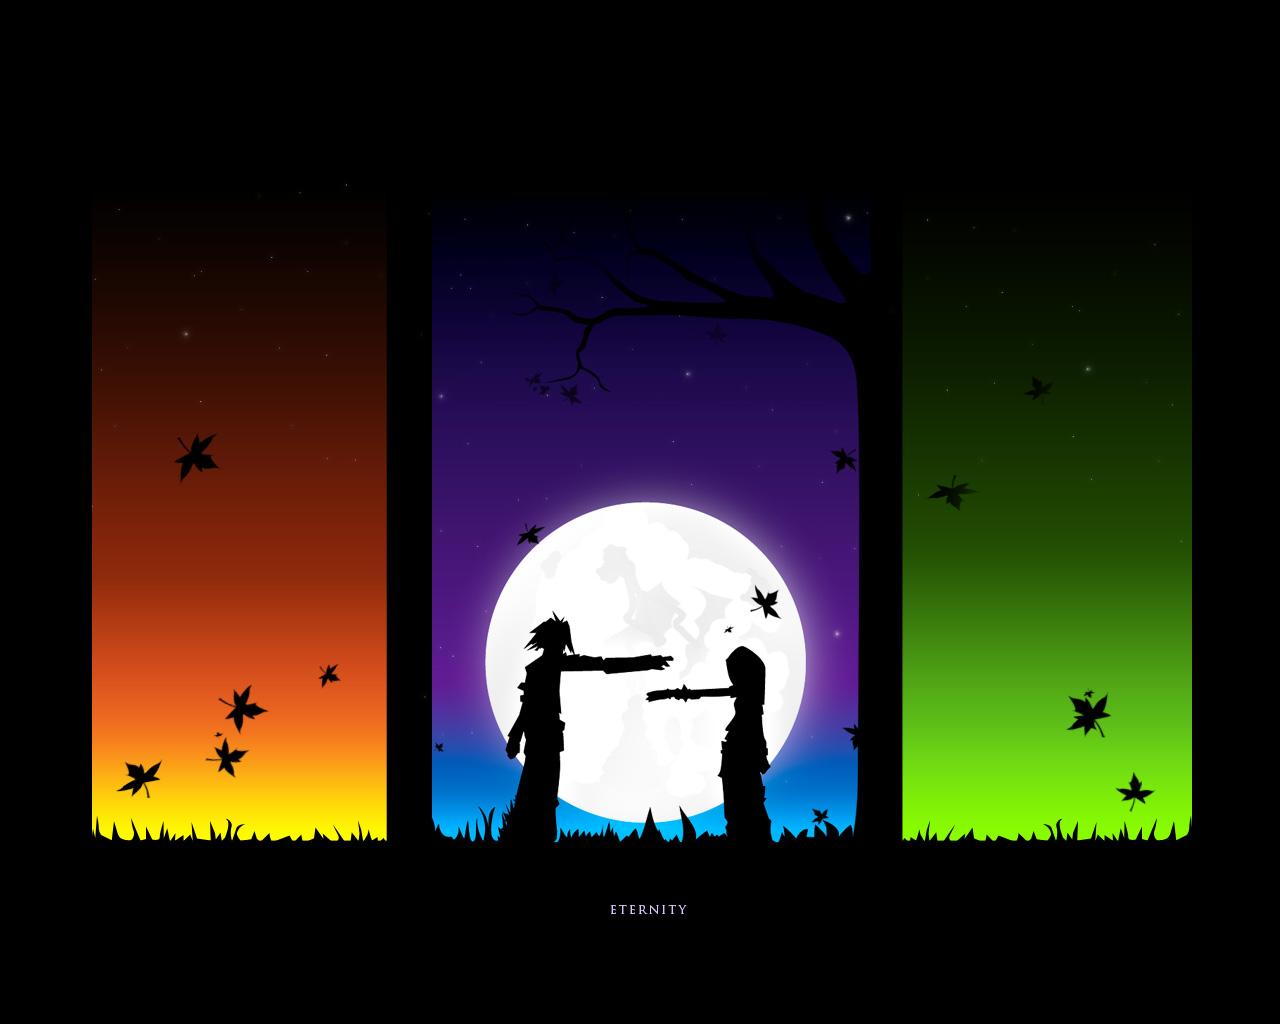 trololo blogg Wallpaper You Can Color 1280x1024